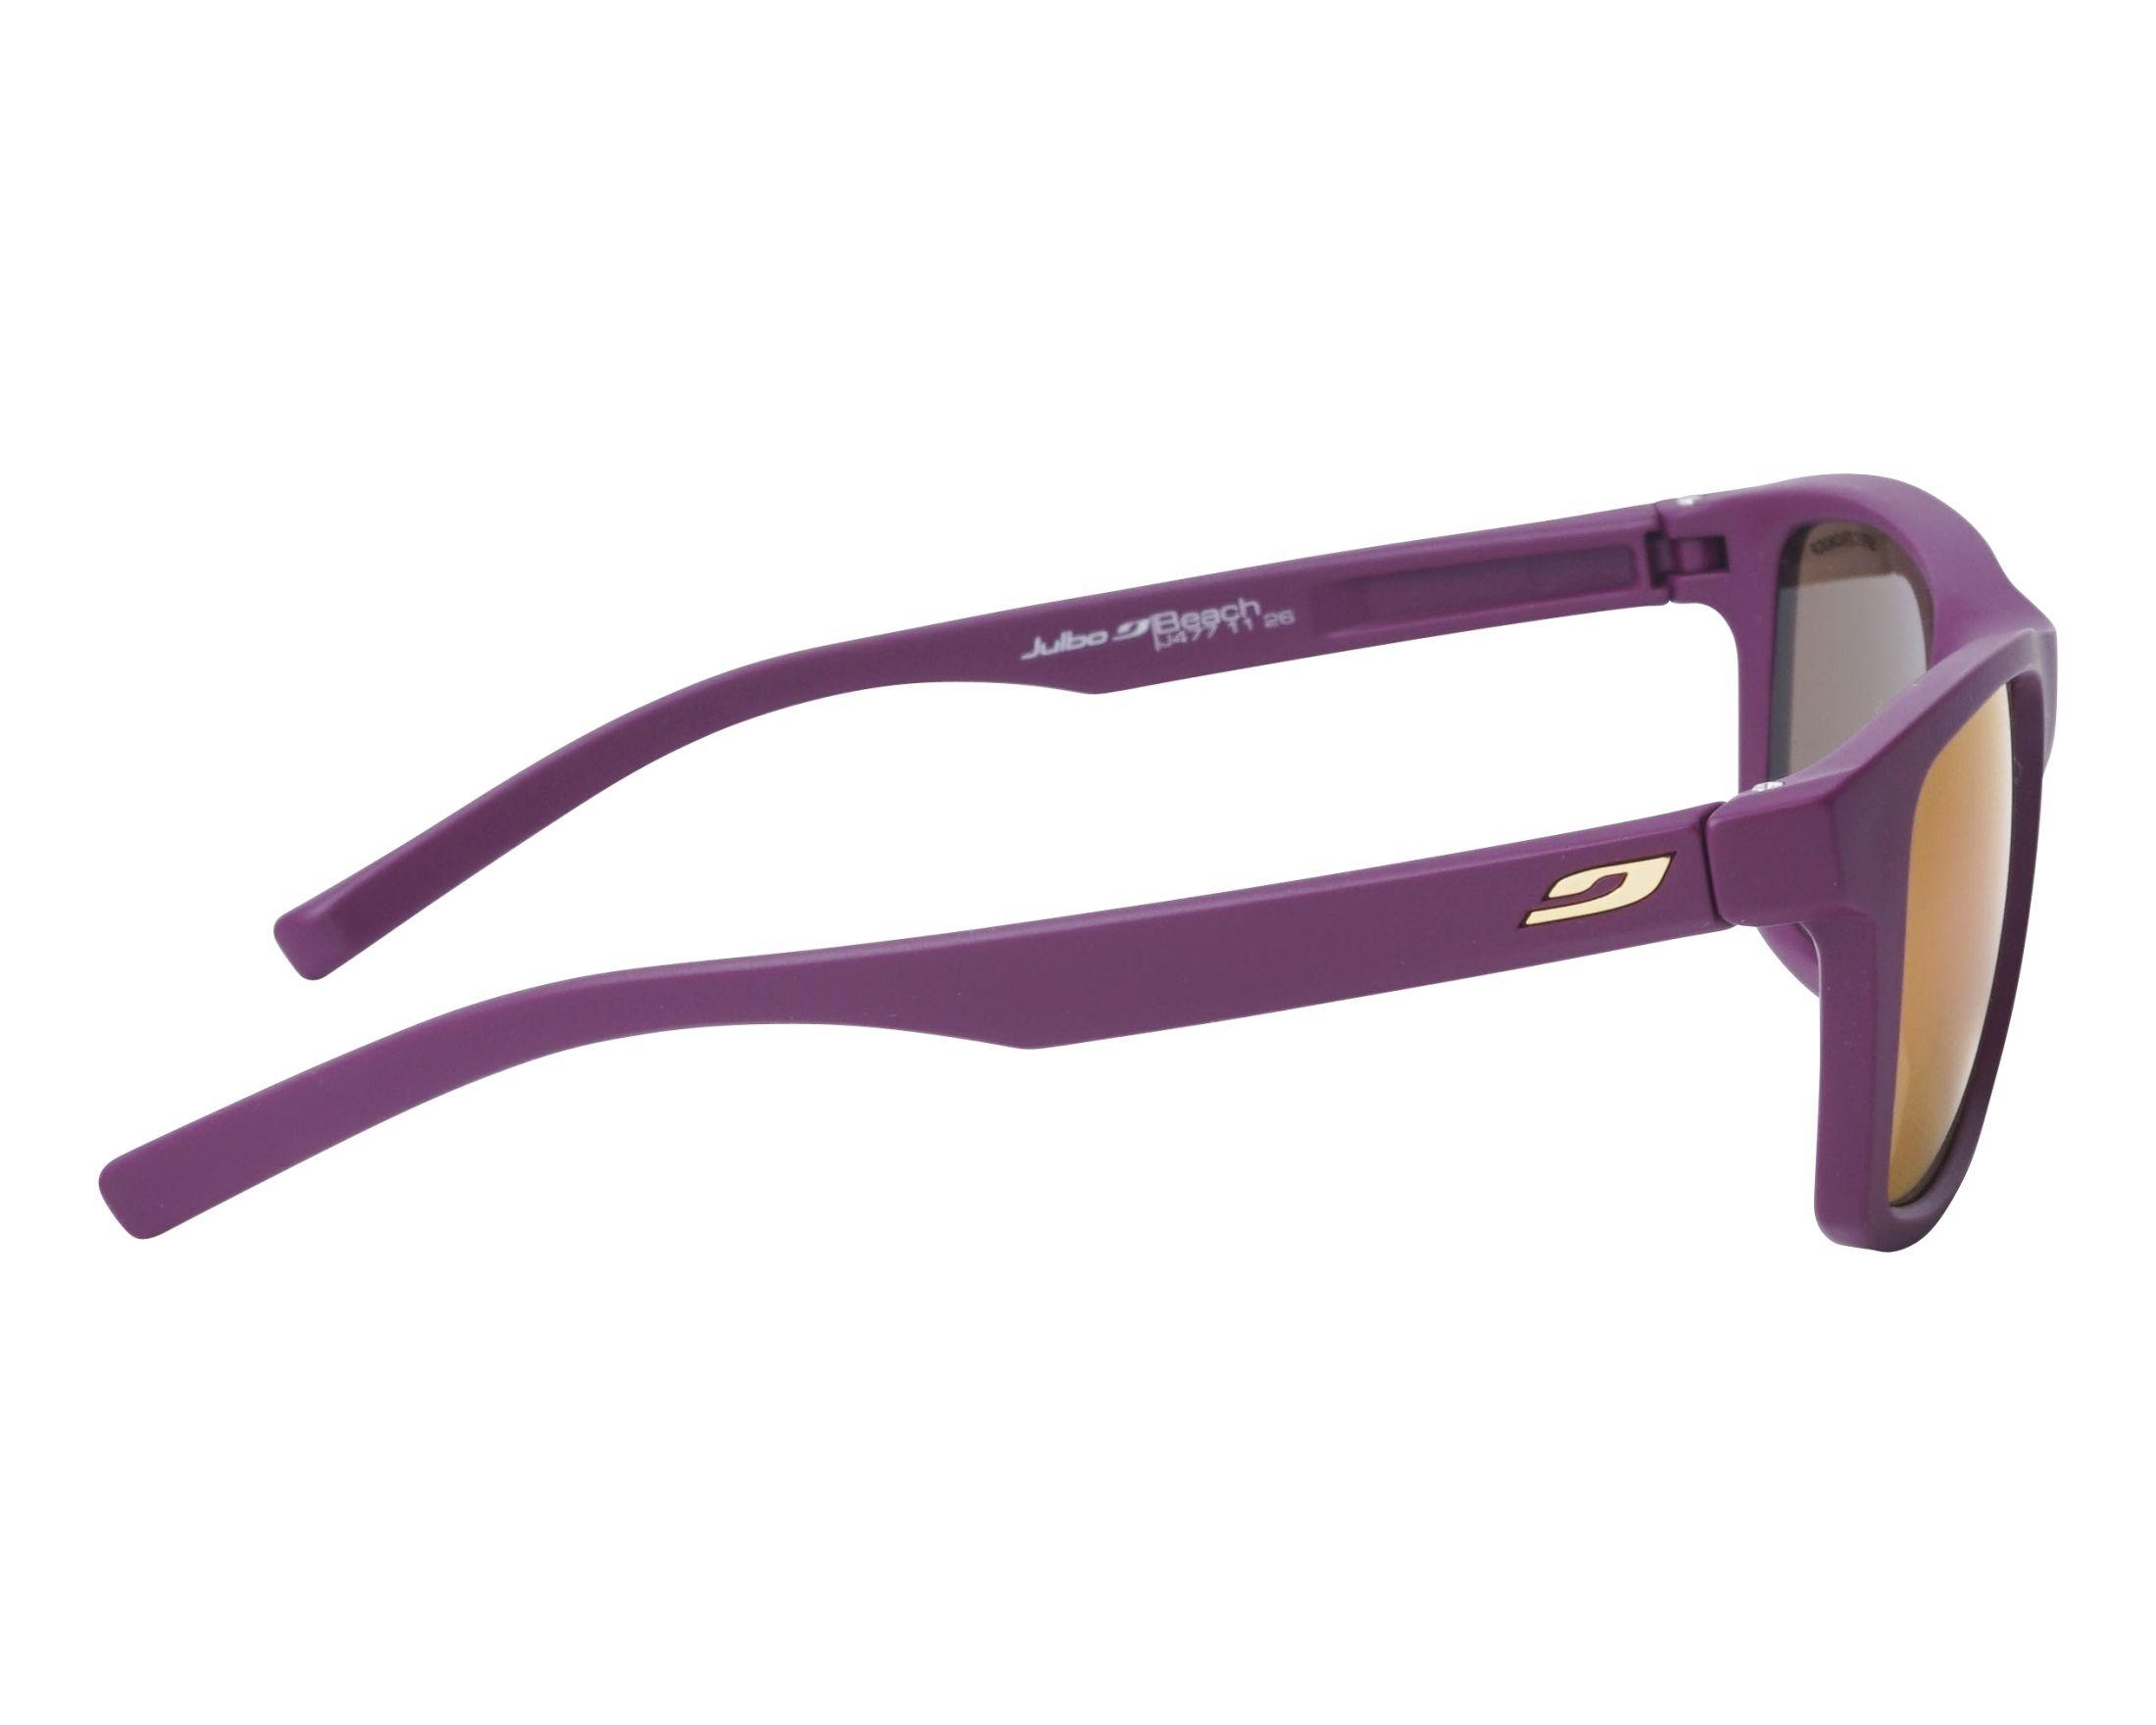 227b2a6b88 thumbnail Sunglasses Julbo J477 1126 50-19 Purple side view